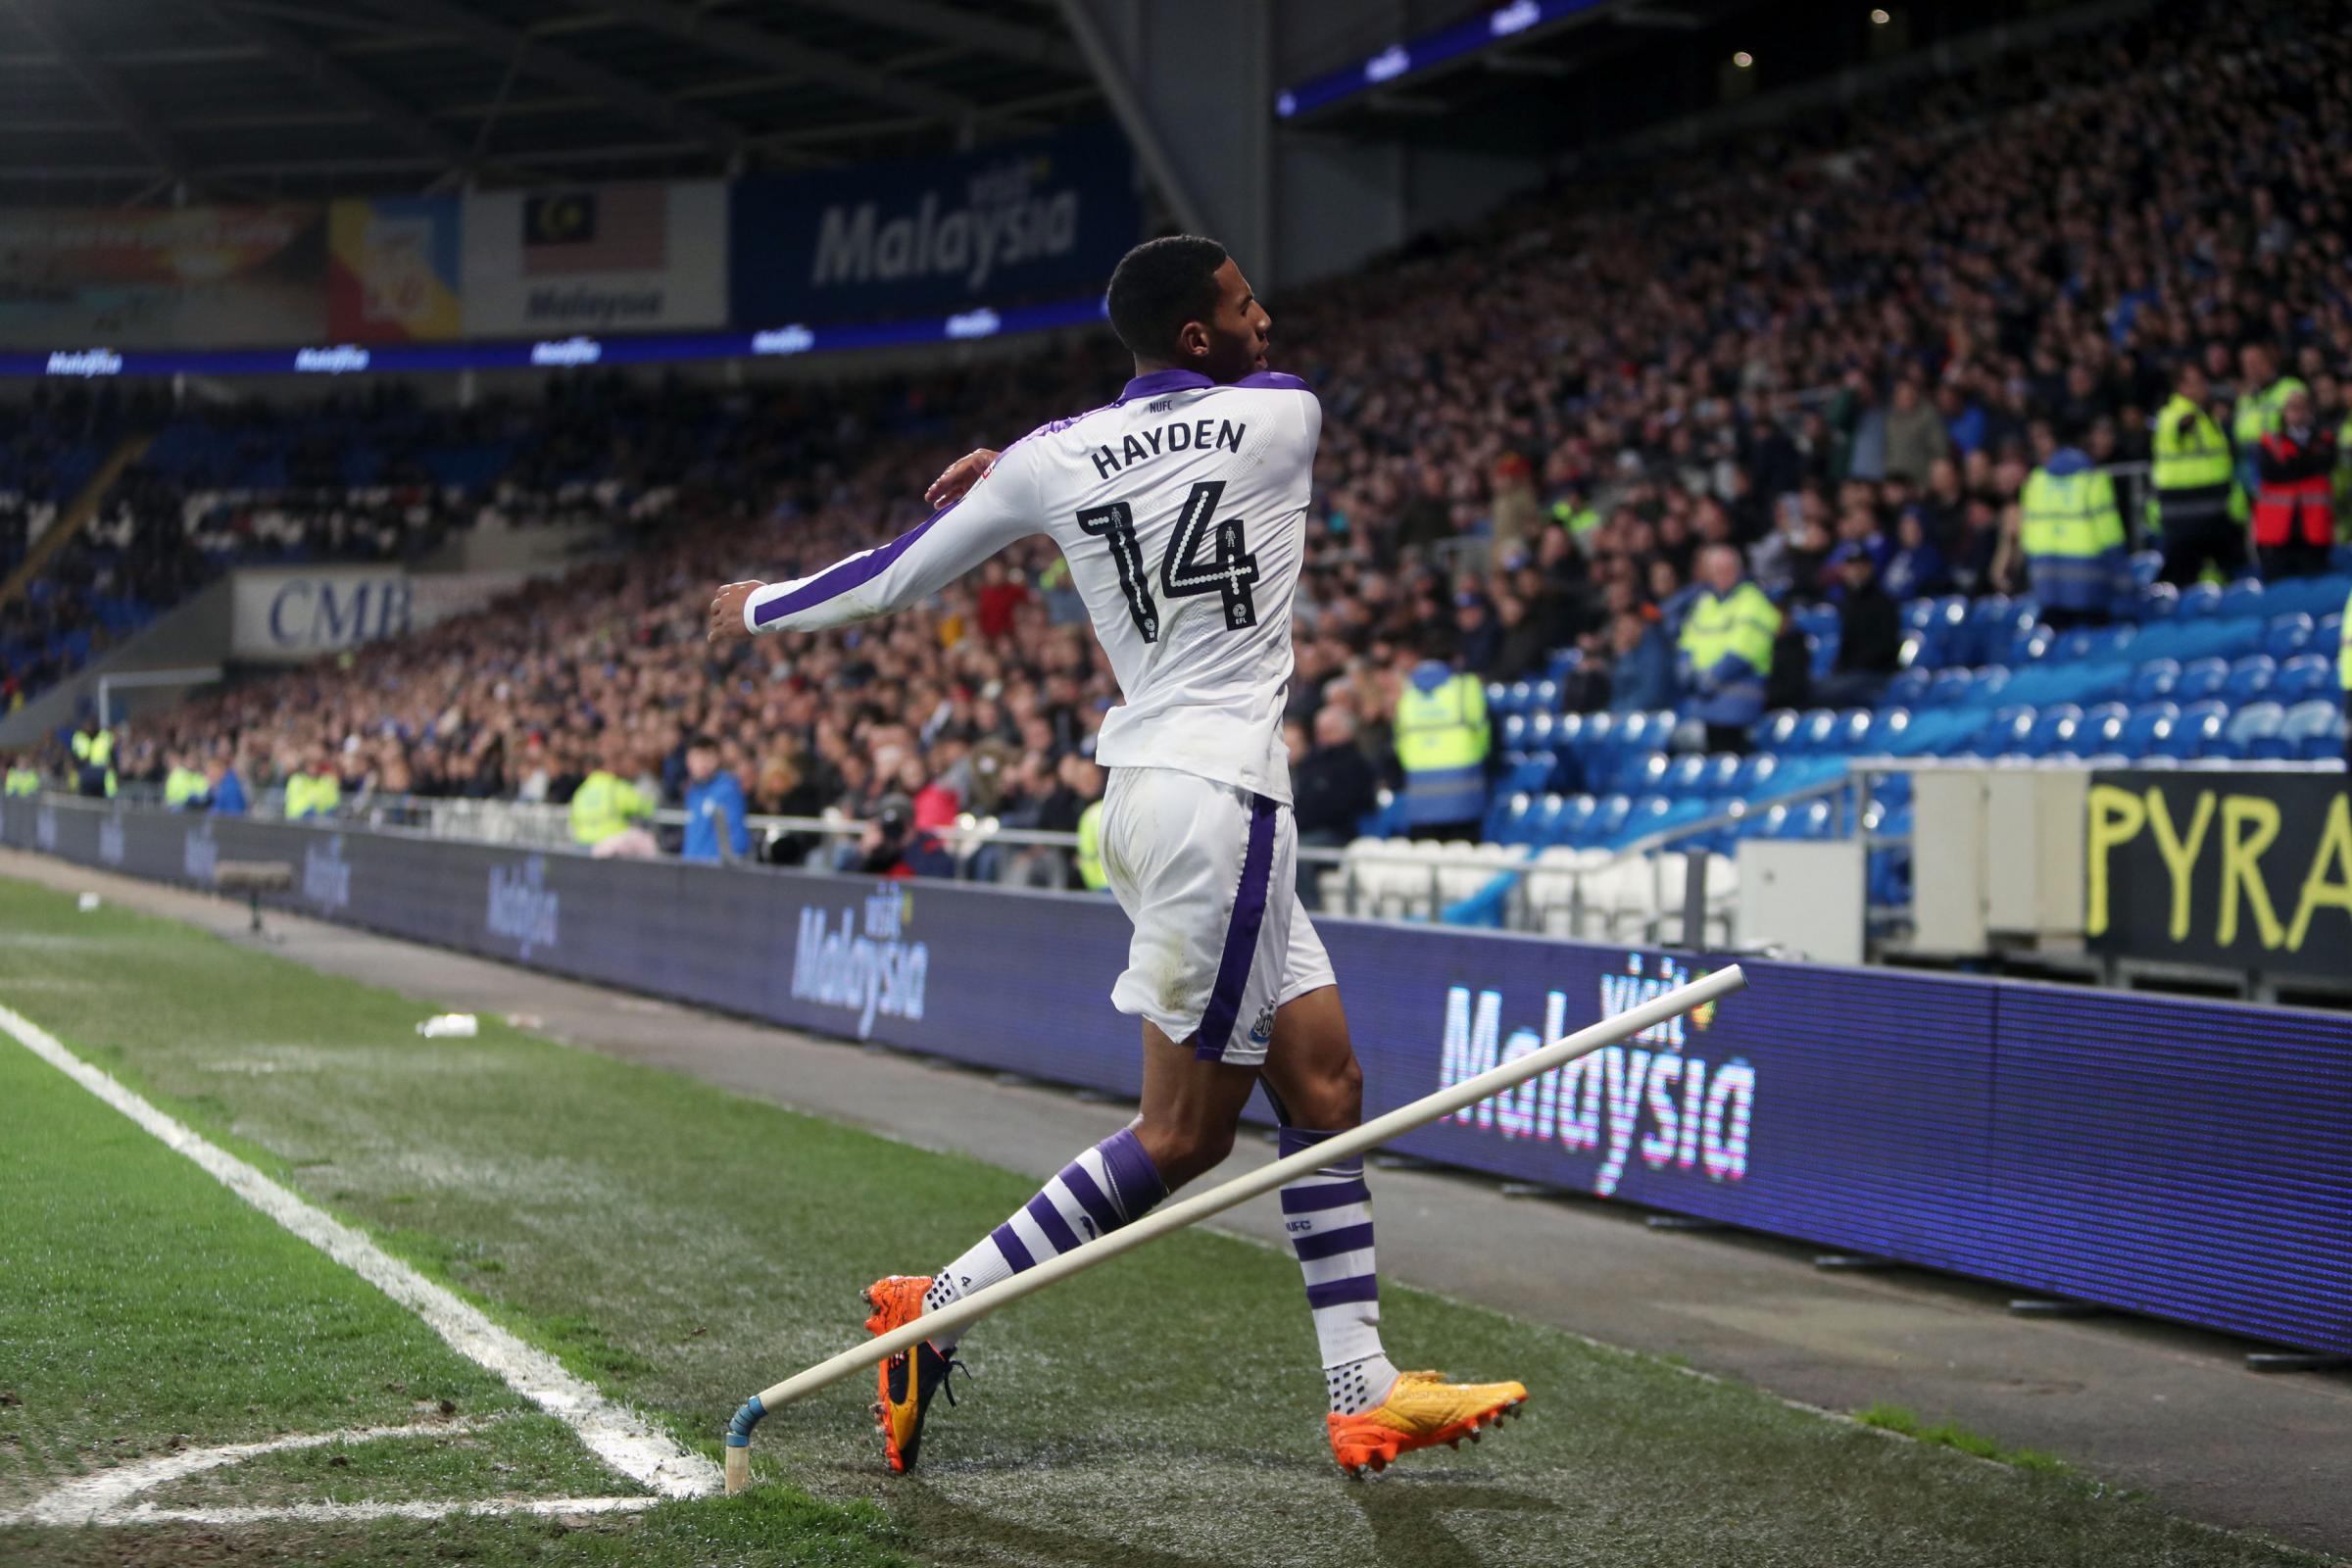 Newcastle: Hayden relishing Premier challenge | The Northern Echo